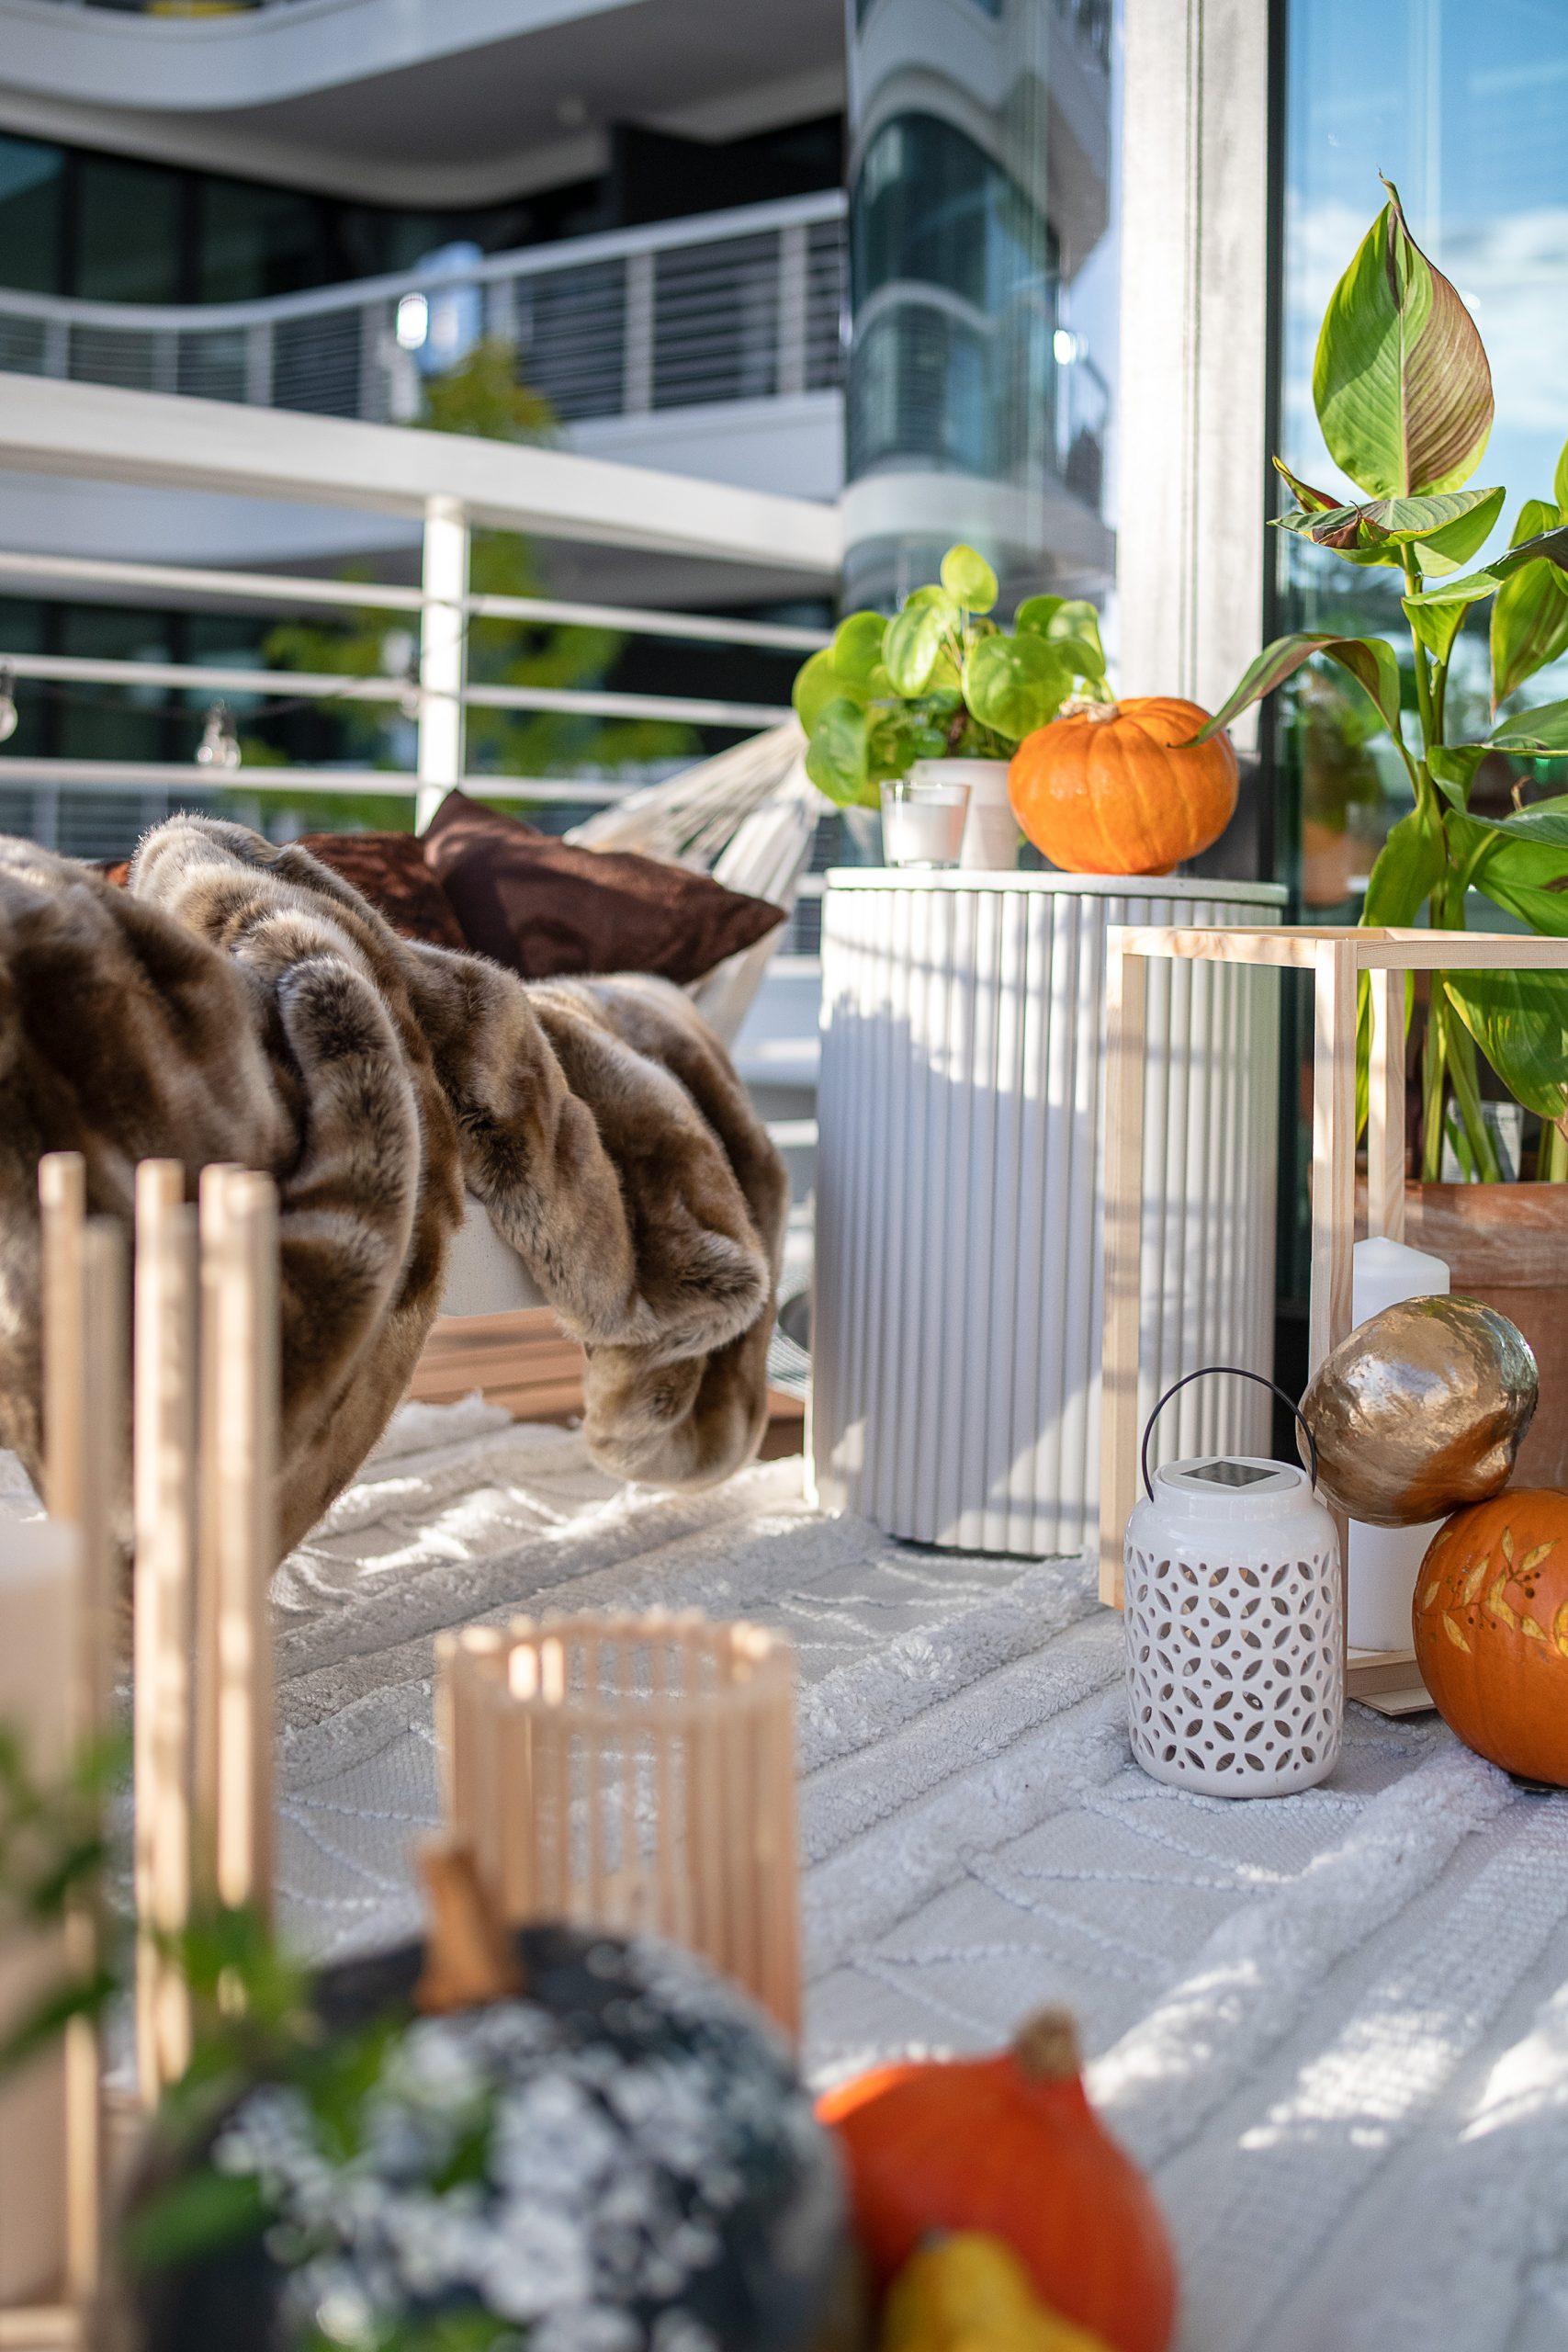 Cozy Outdoor Space with Hammock